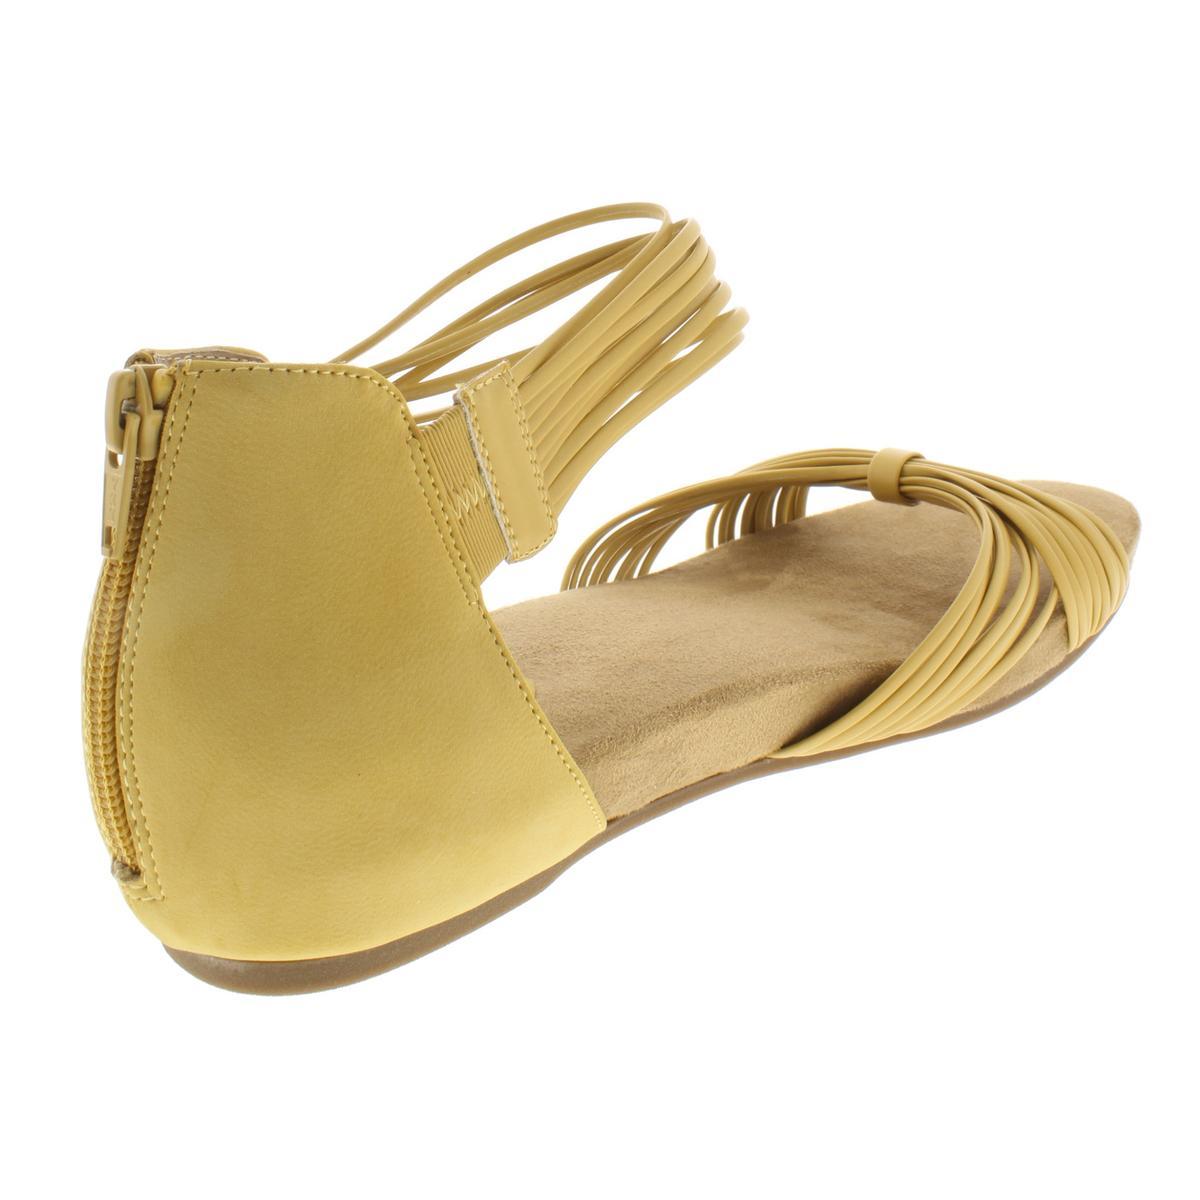 Giani-Bernini-Womens-Jhene-Strappy-Criss-Cross-Sandals-Shoes-Flats-BHFO-9685 thumbnail 7